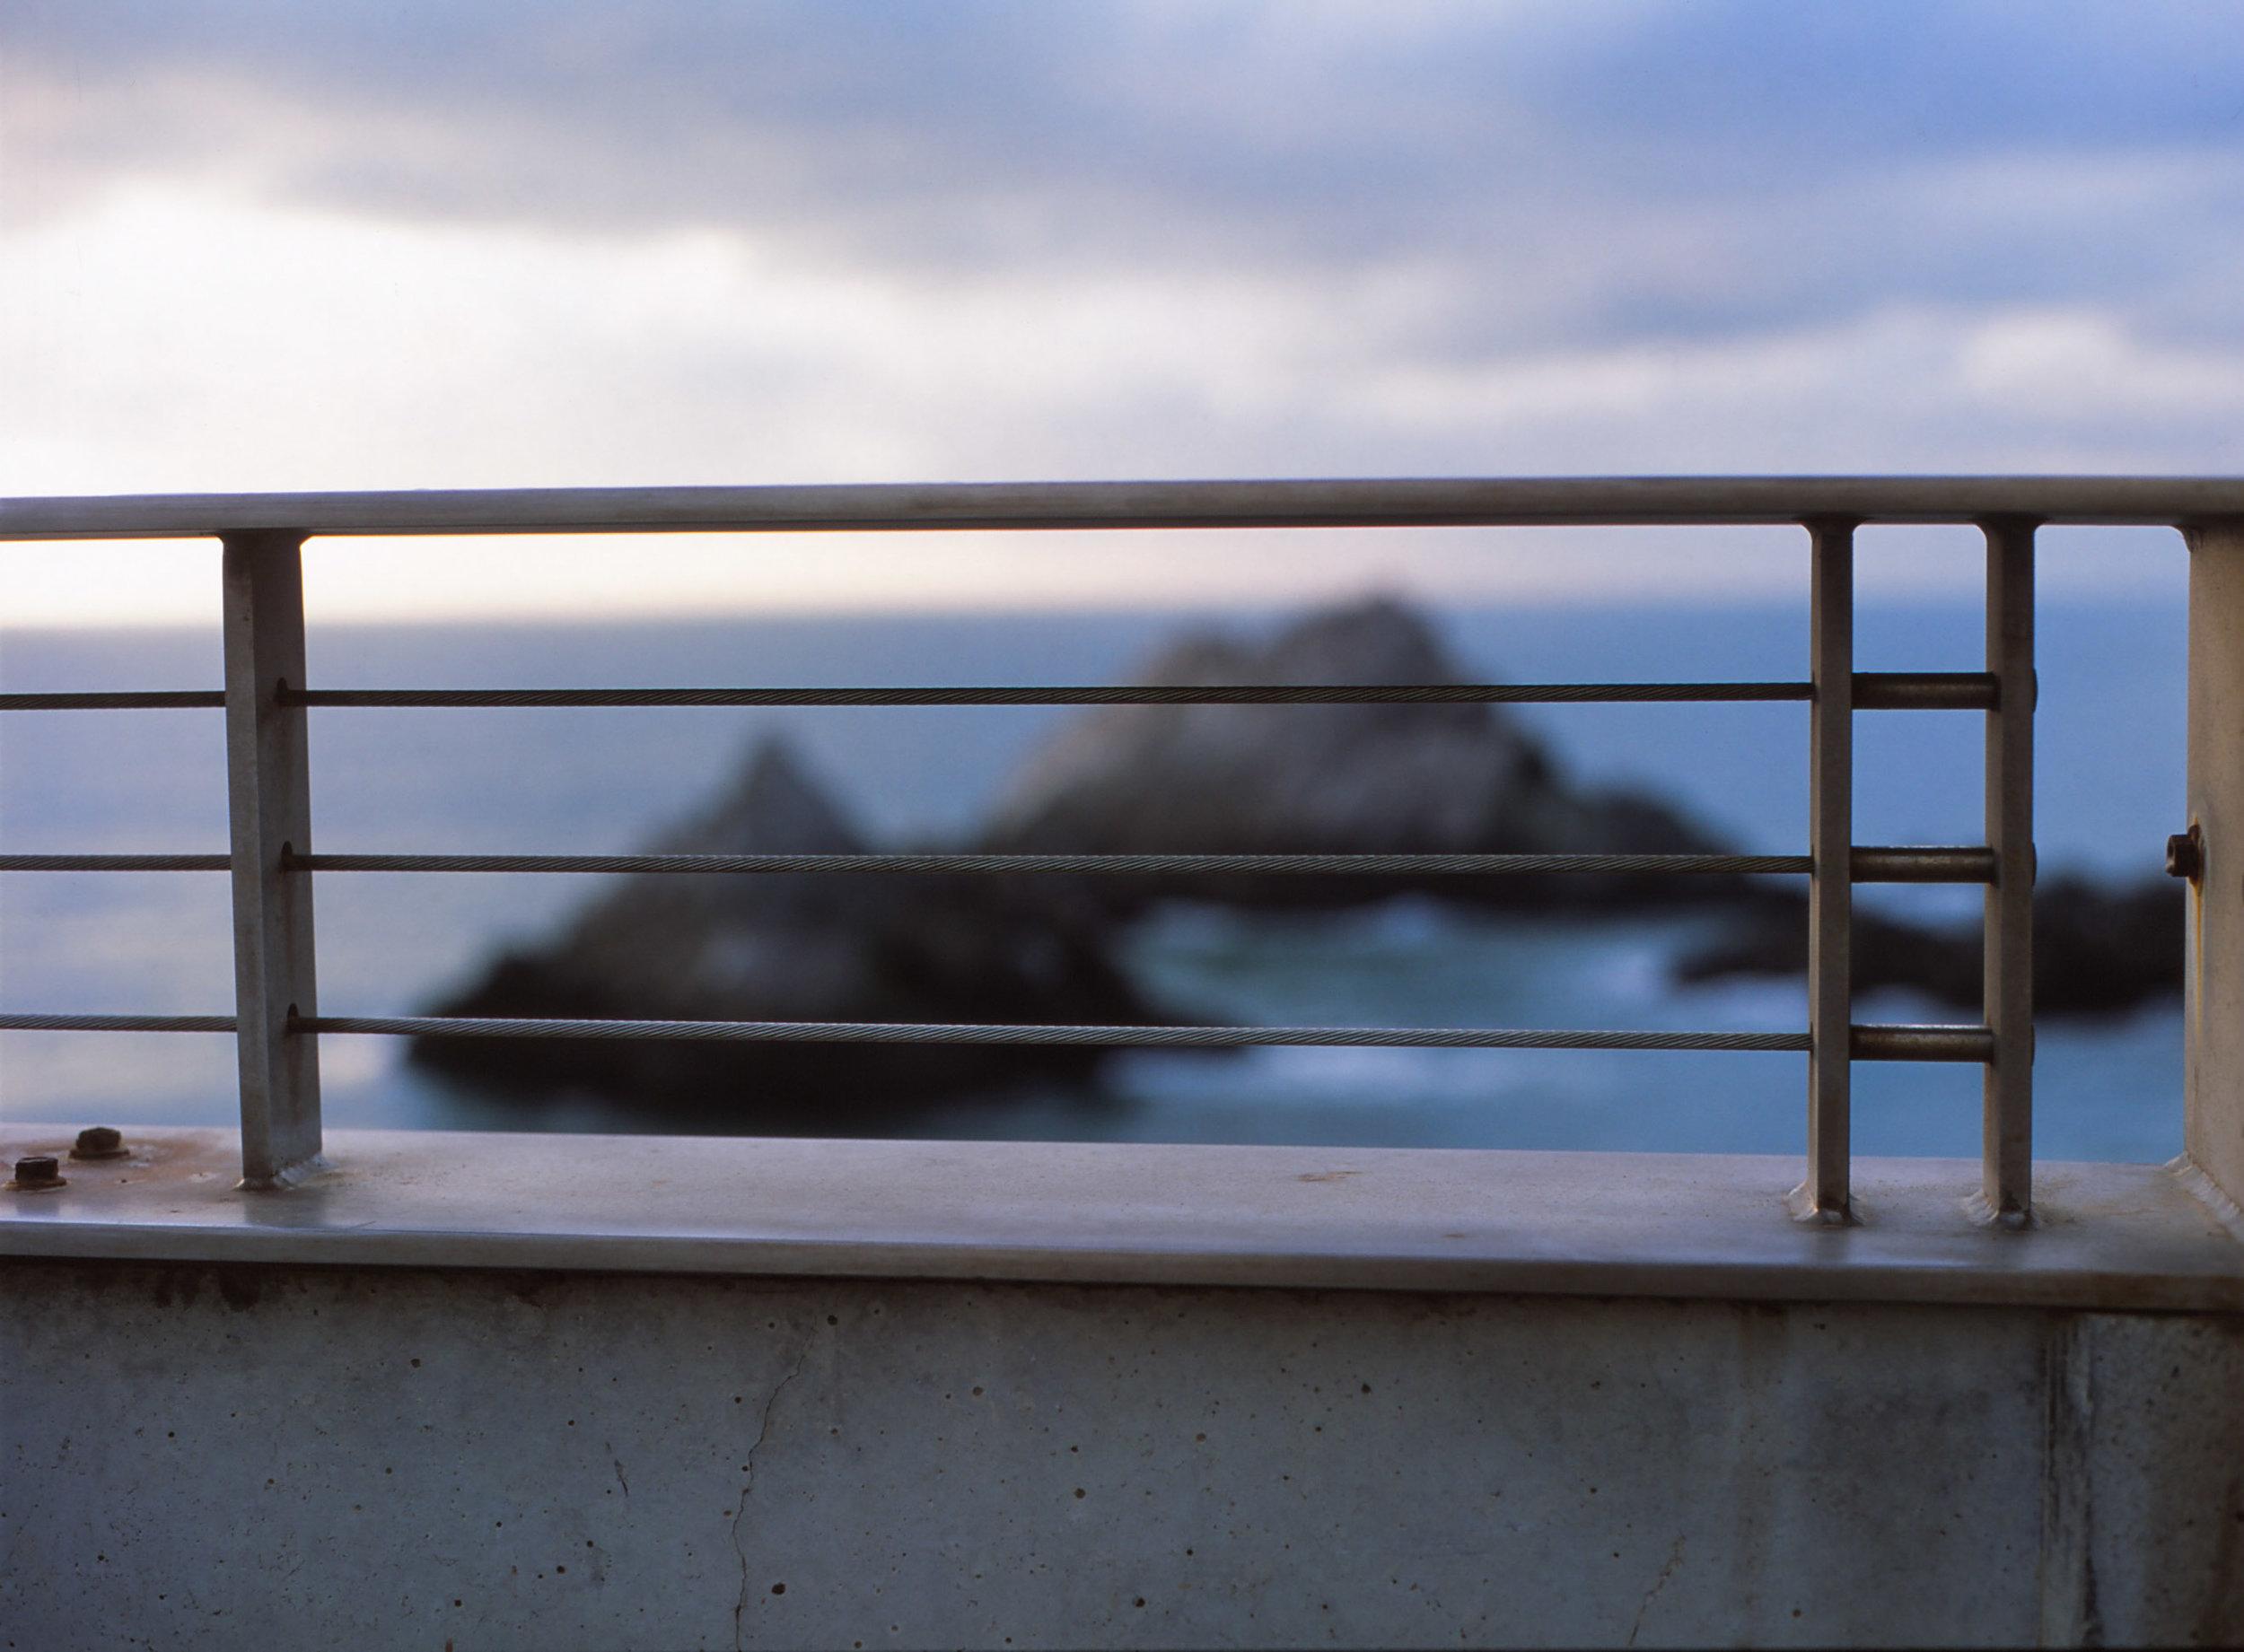 Mamiya - Provia 100F - SF sutro heights railing.jpg